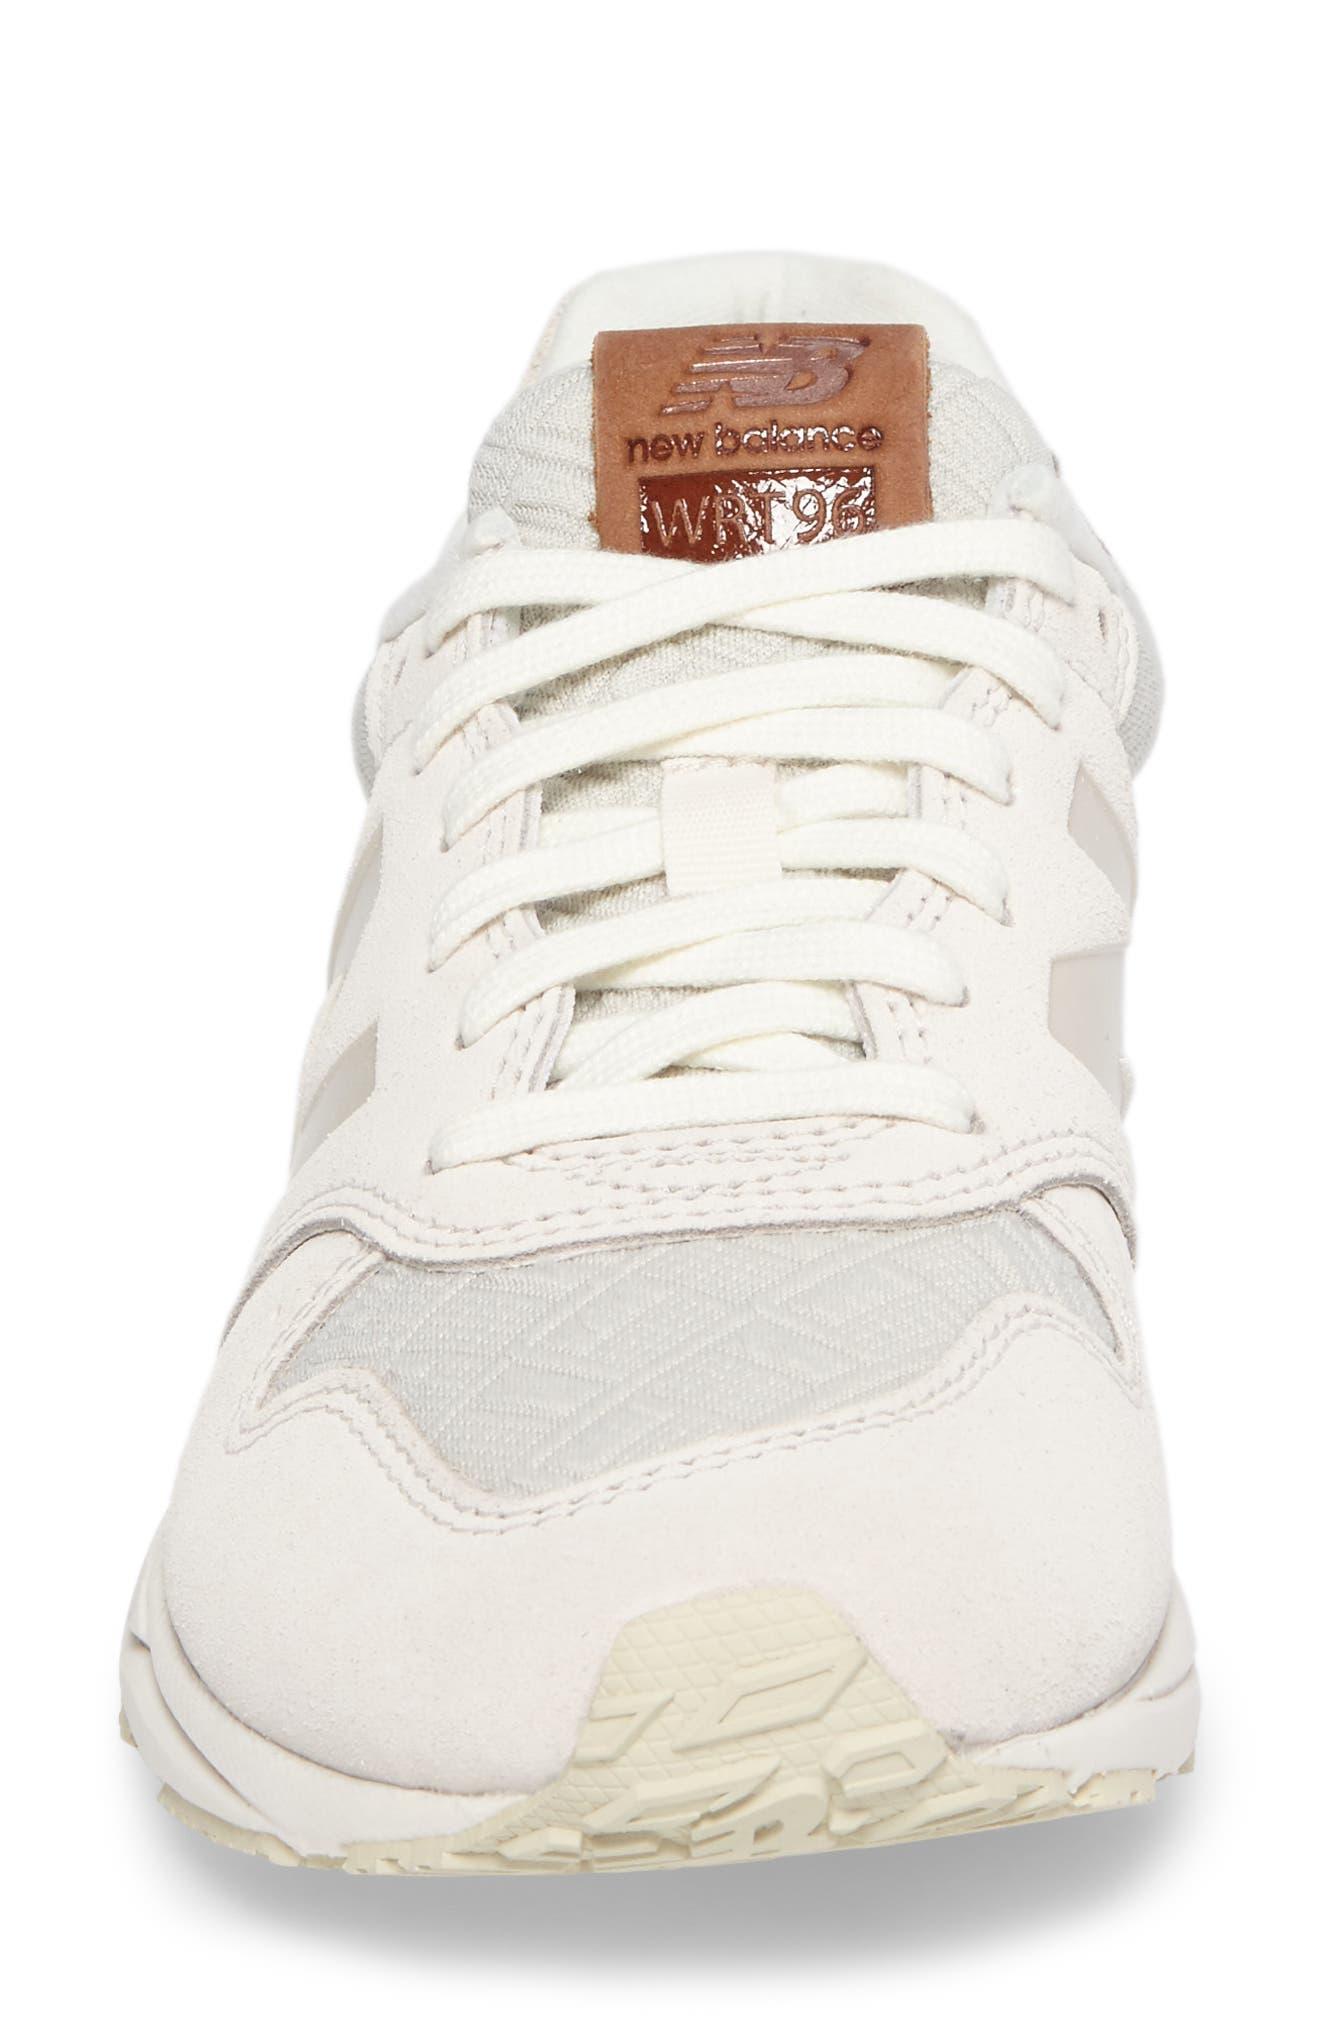 96 Mash-Up Sneaker,                             Alternate thumbnail 4, color,                             250